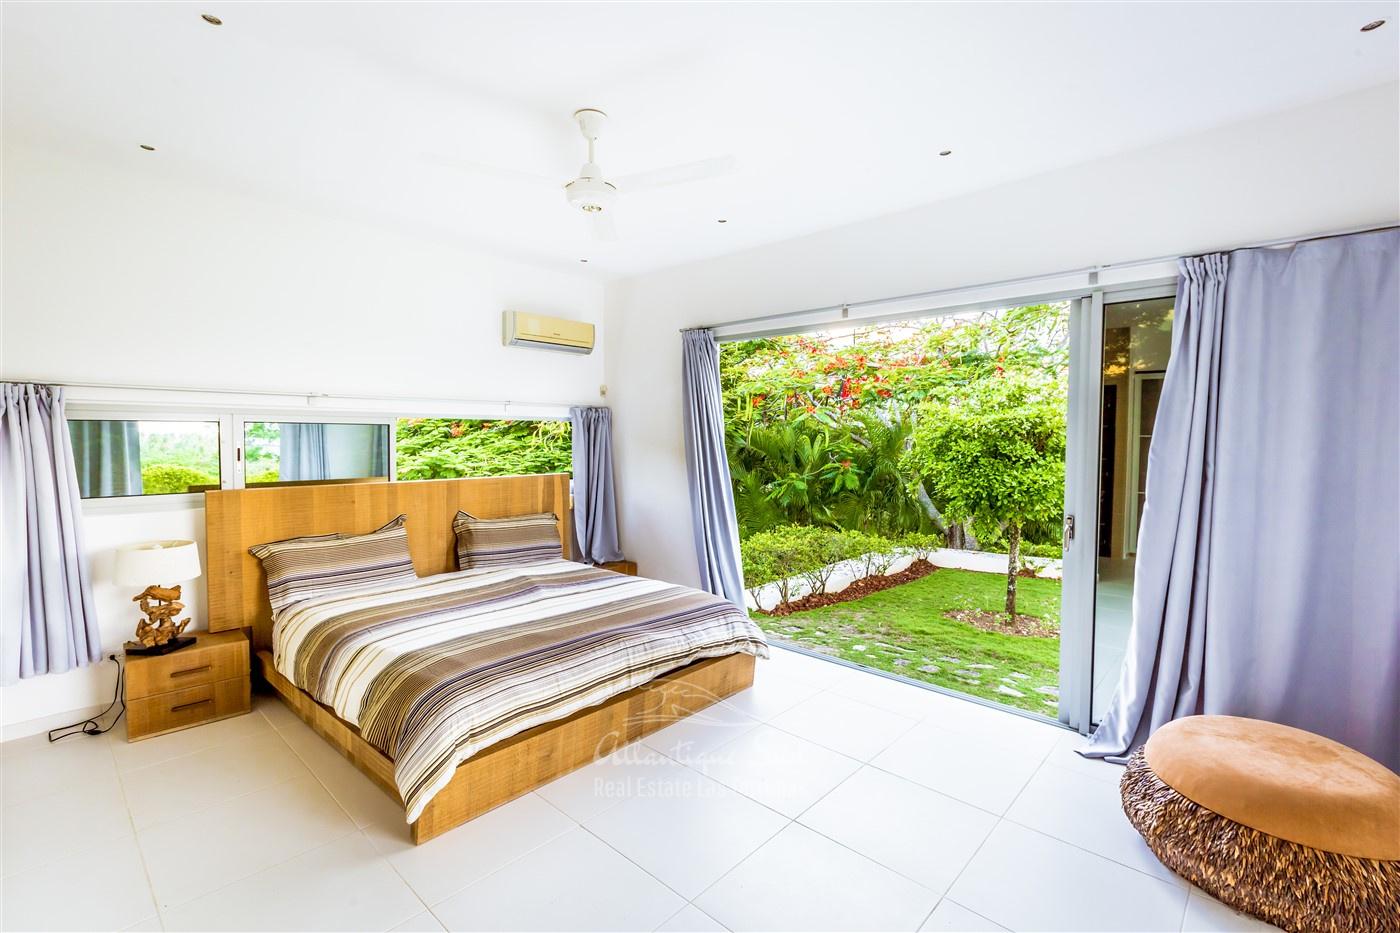 Modern Villa on a hill with ocean views Real Estate Las Terrenas Dominican Republic19.jpg